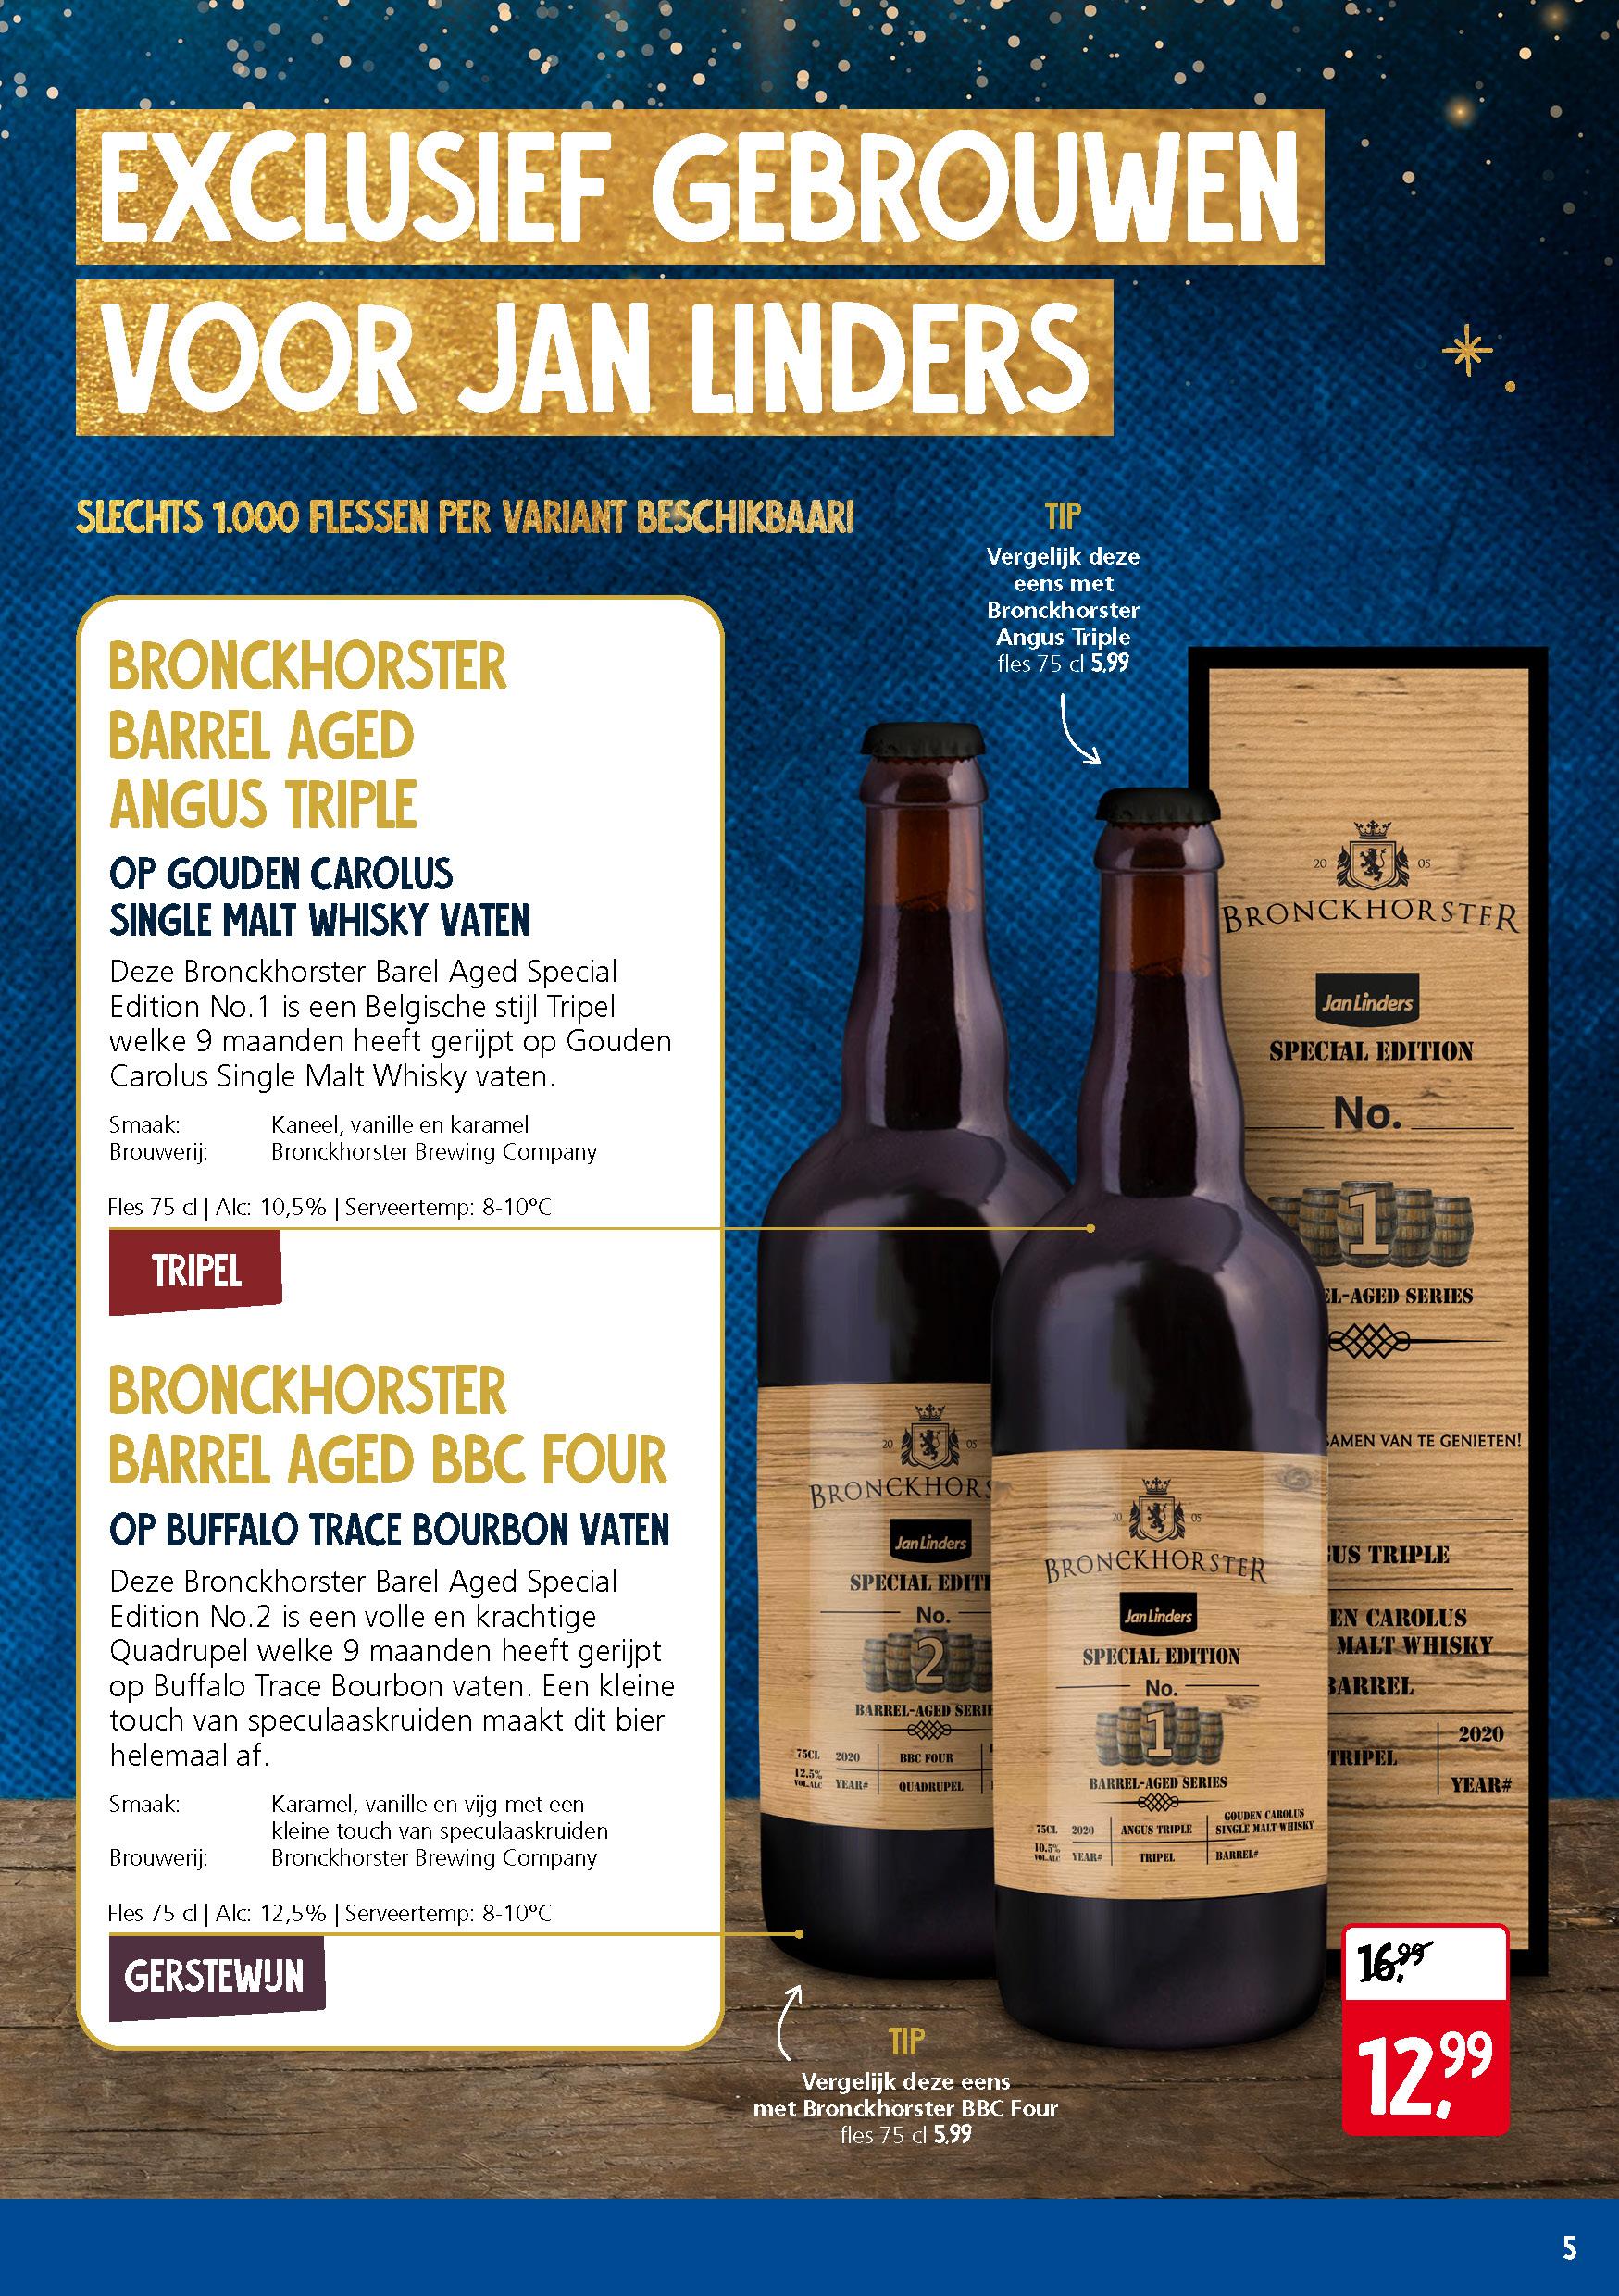 75cl Barrel Aged bieren van Bronckhorster Brewing Company (Limited Jan Linders edition)